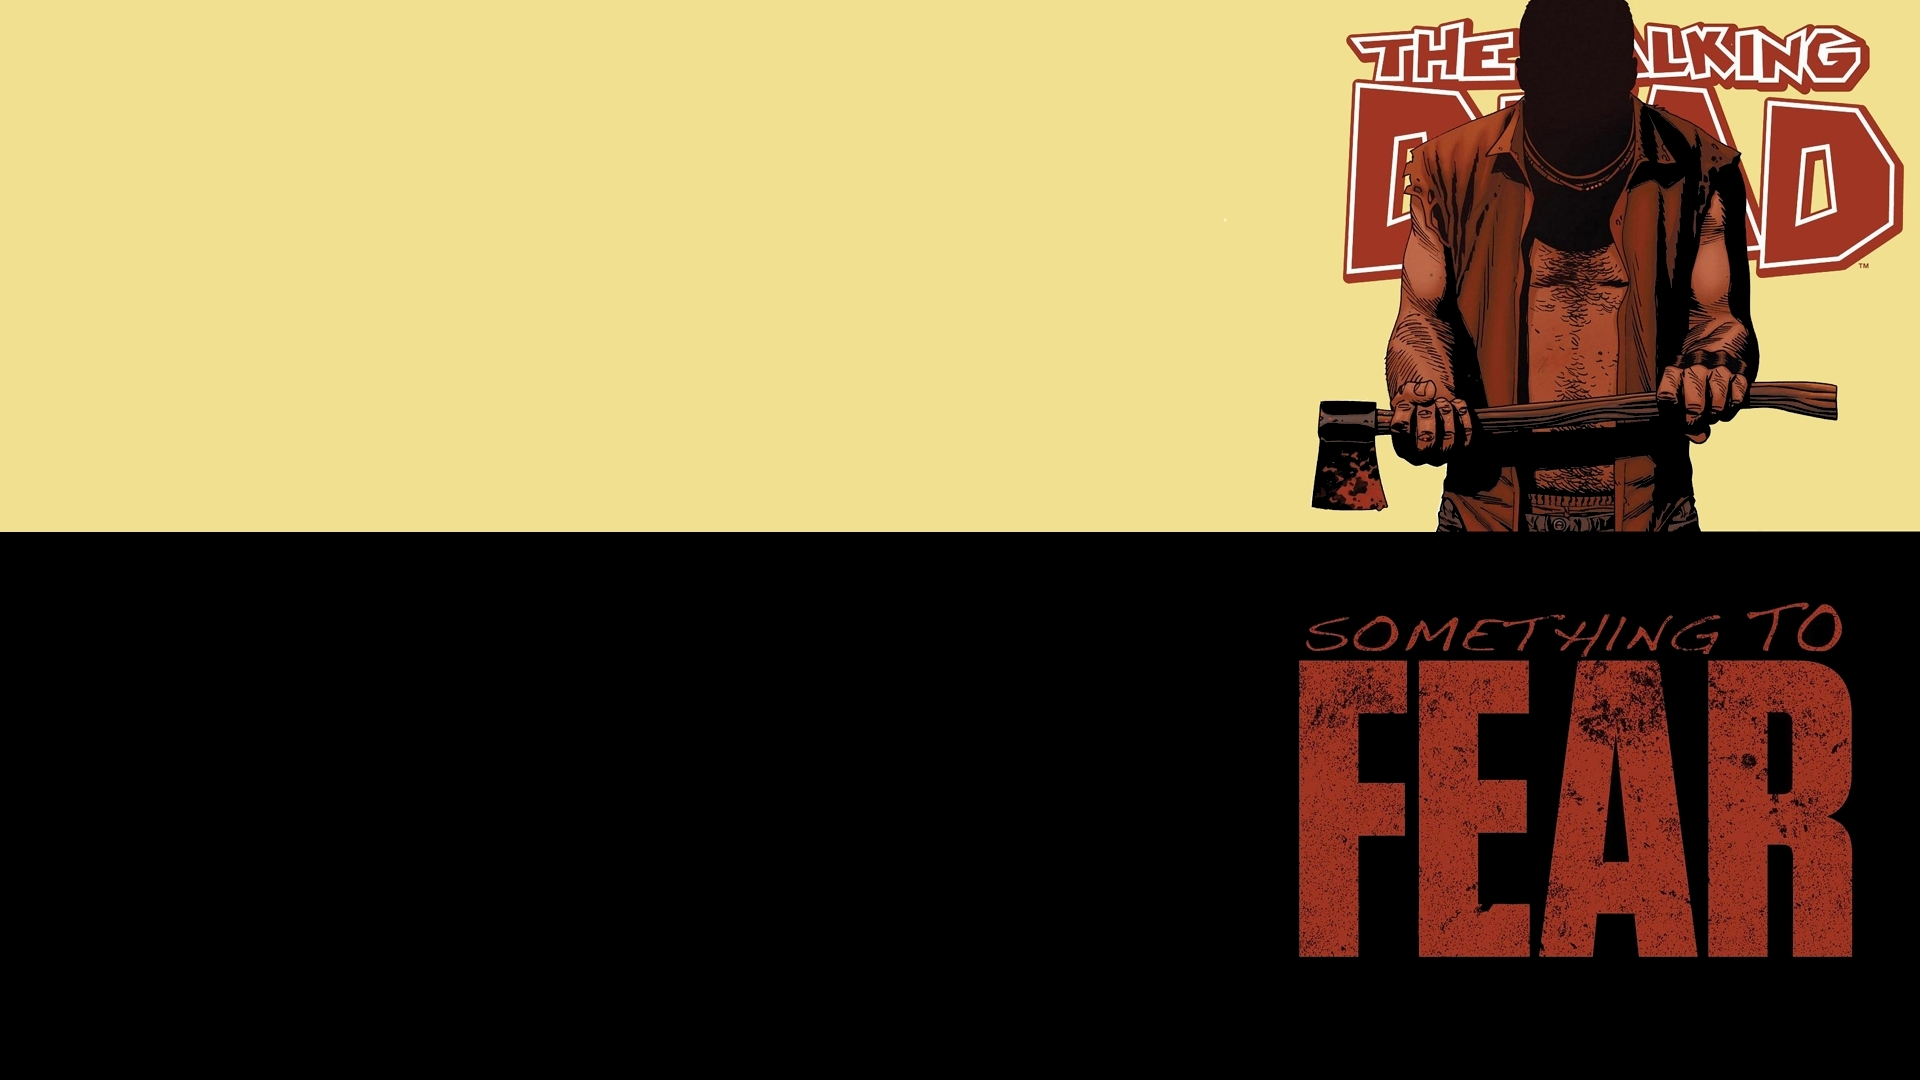 Free Download Dont Fear The Walking Dead Wallpaper 1920x1080